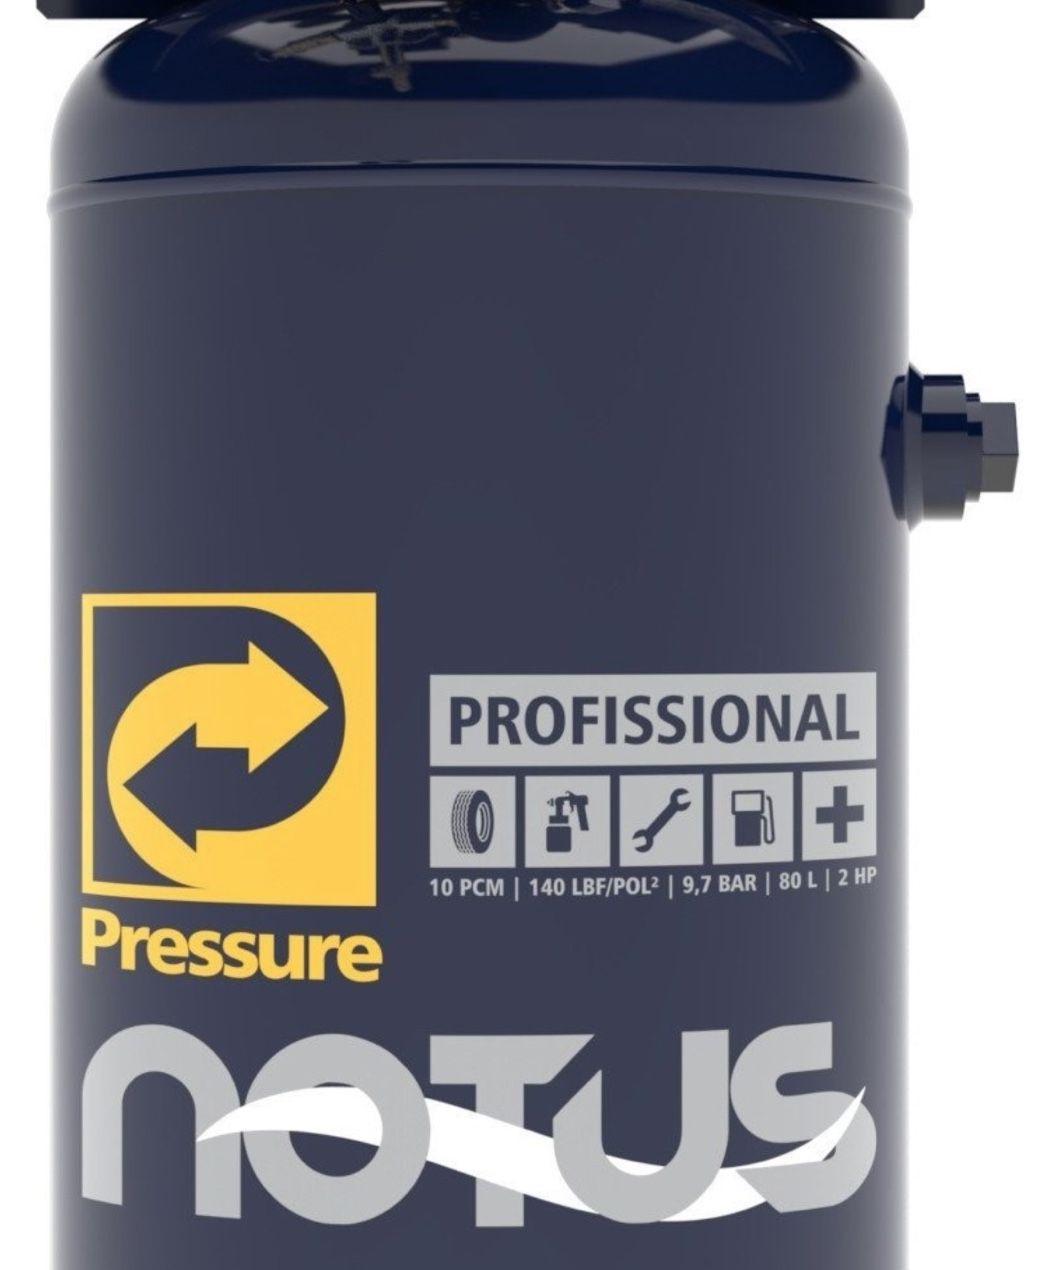 Compressor Ar Pressure Vertical Notus 10/80V 80 Litros Movel 140 psi 02 Hp Monofásico